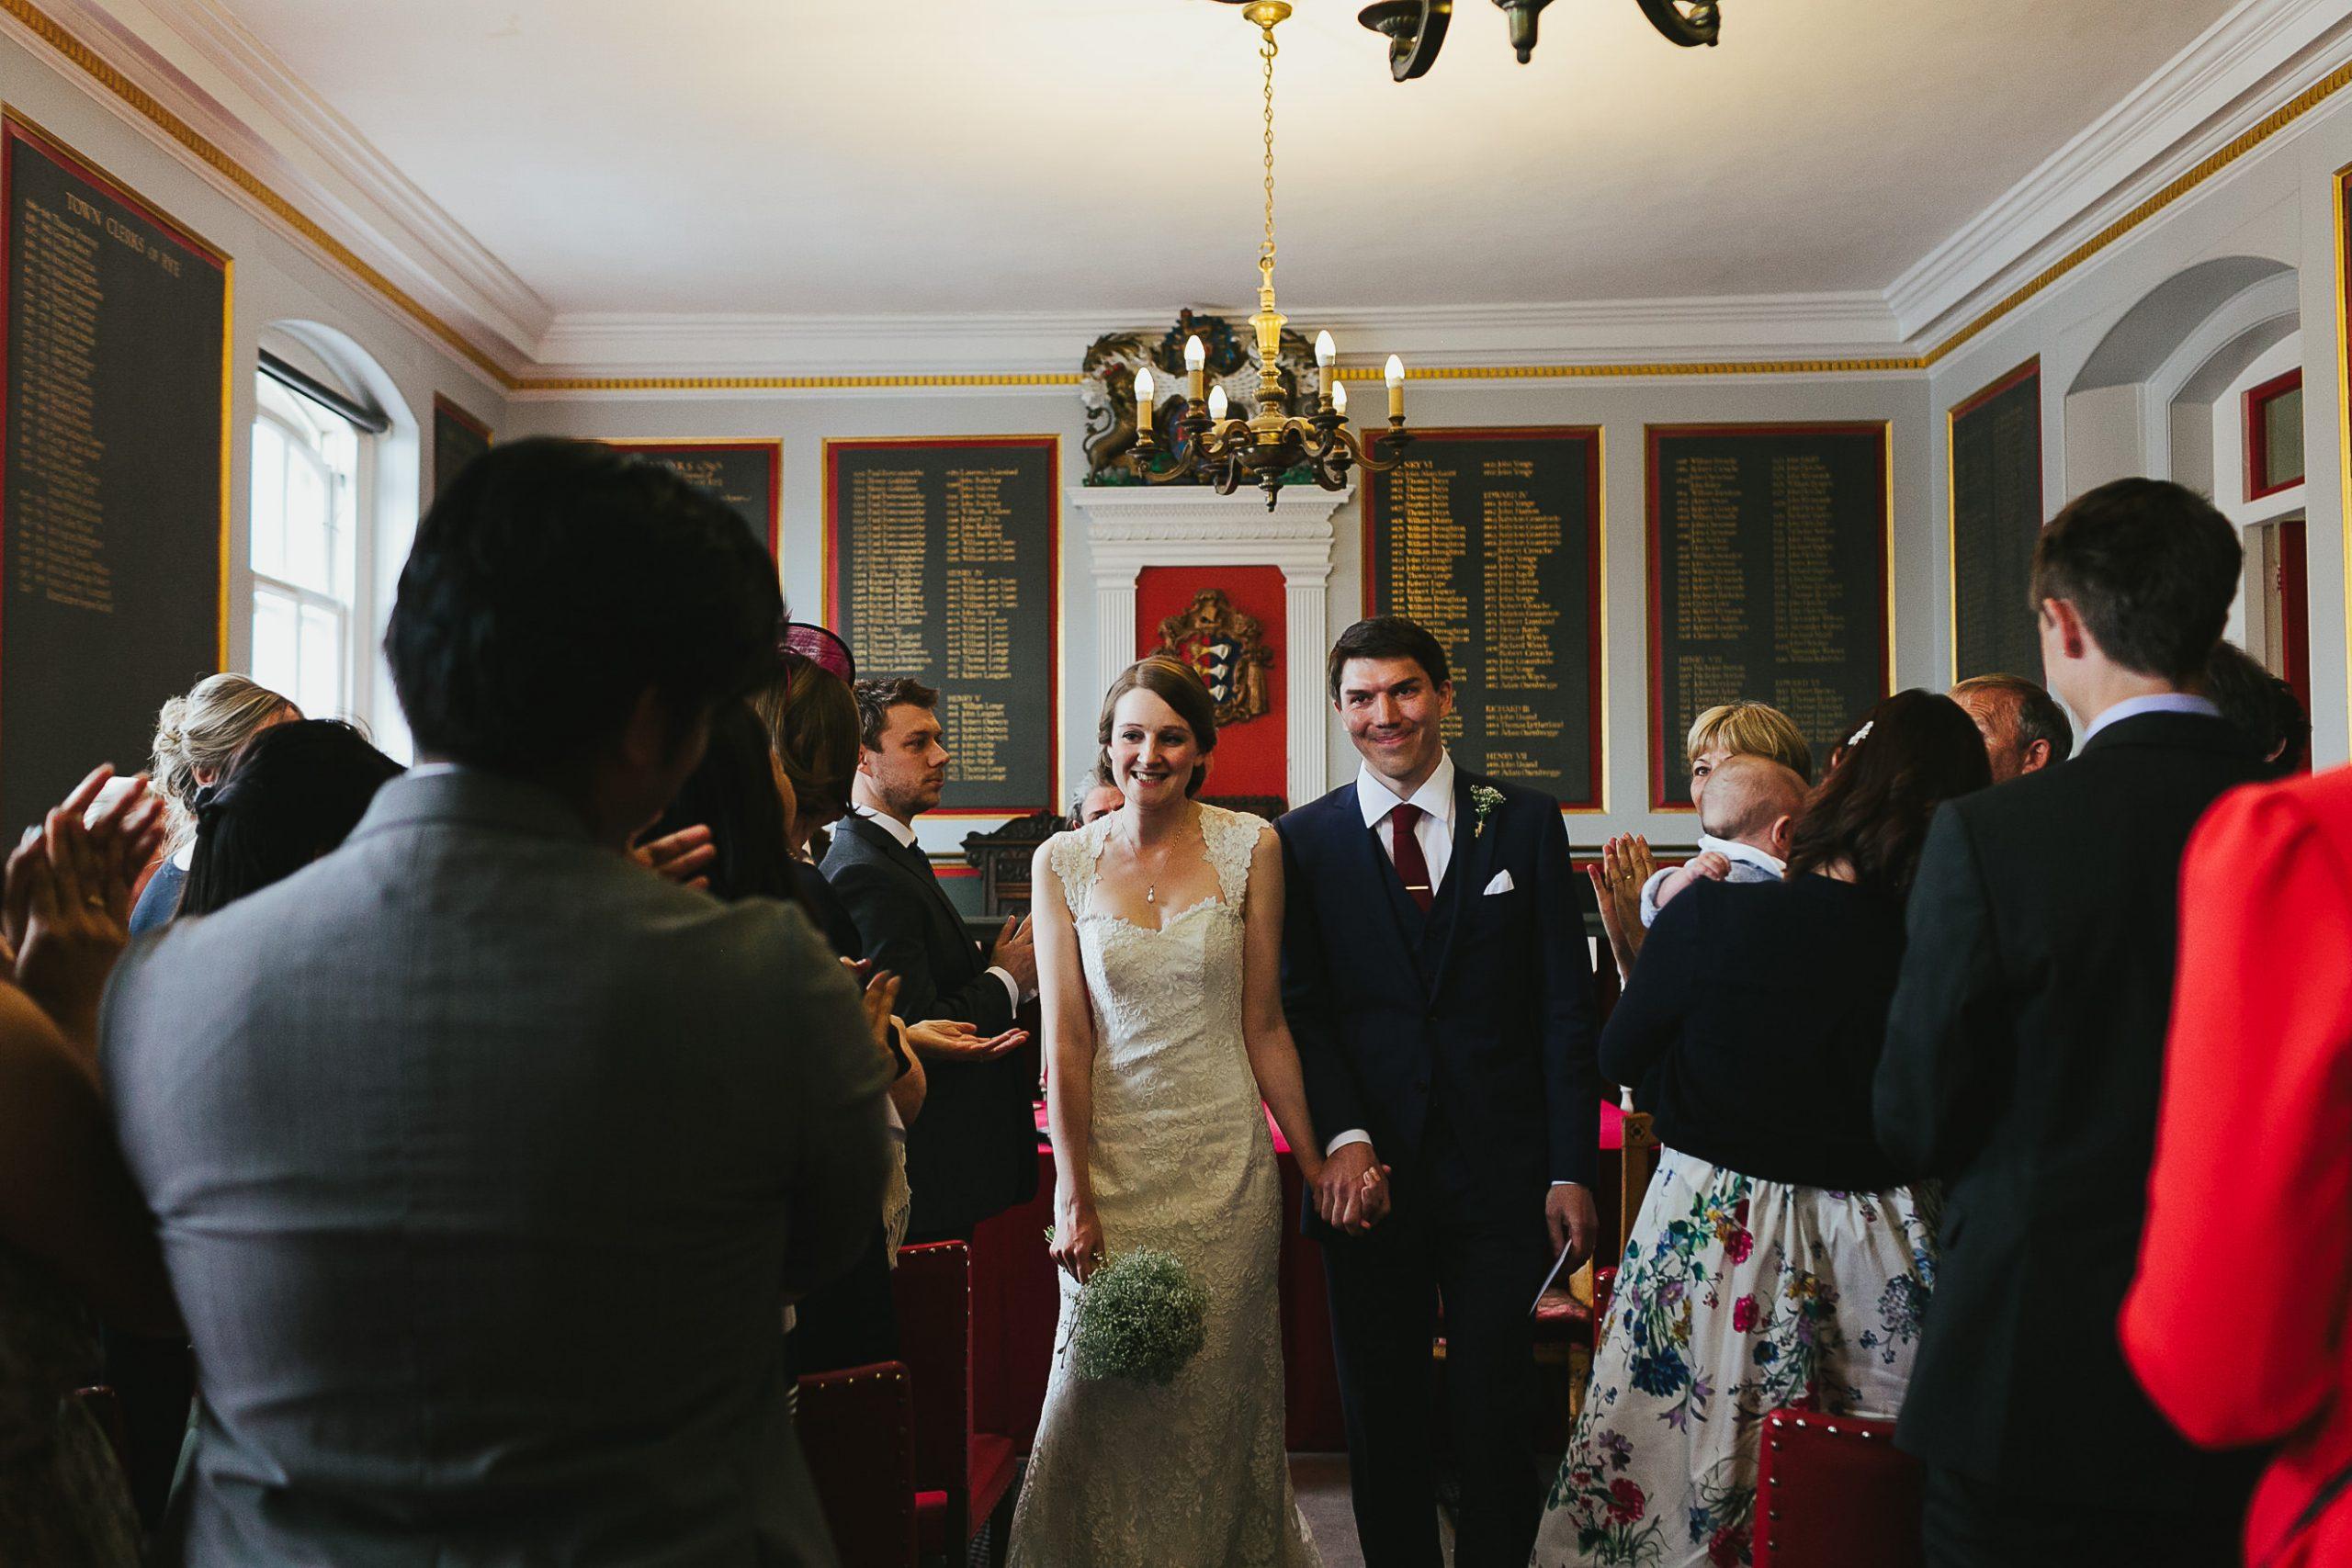 Rye Town Hall wedding - Ali & Ben